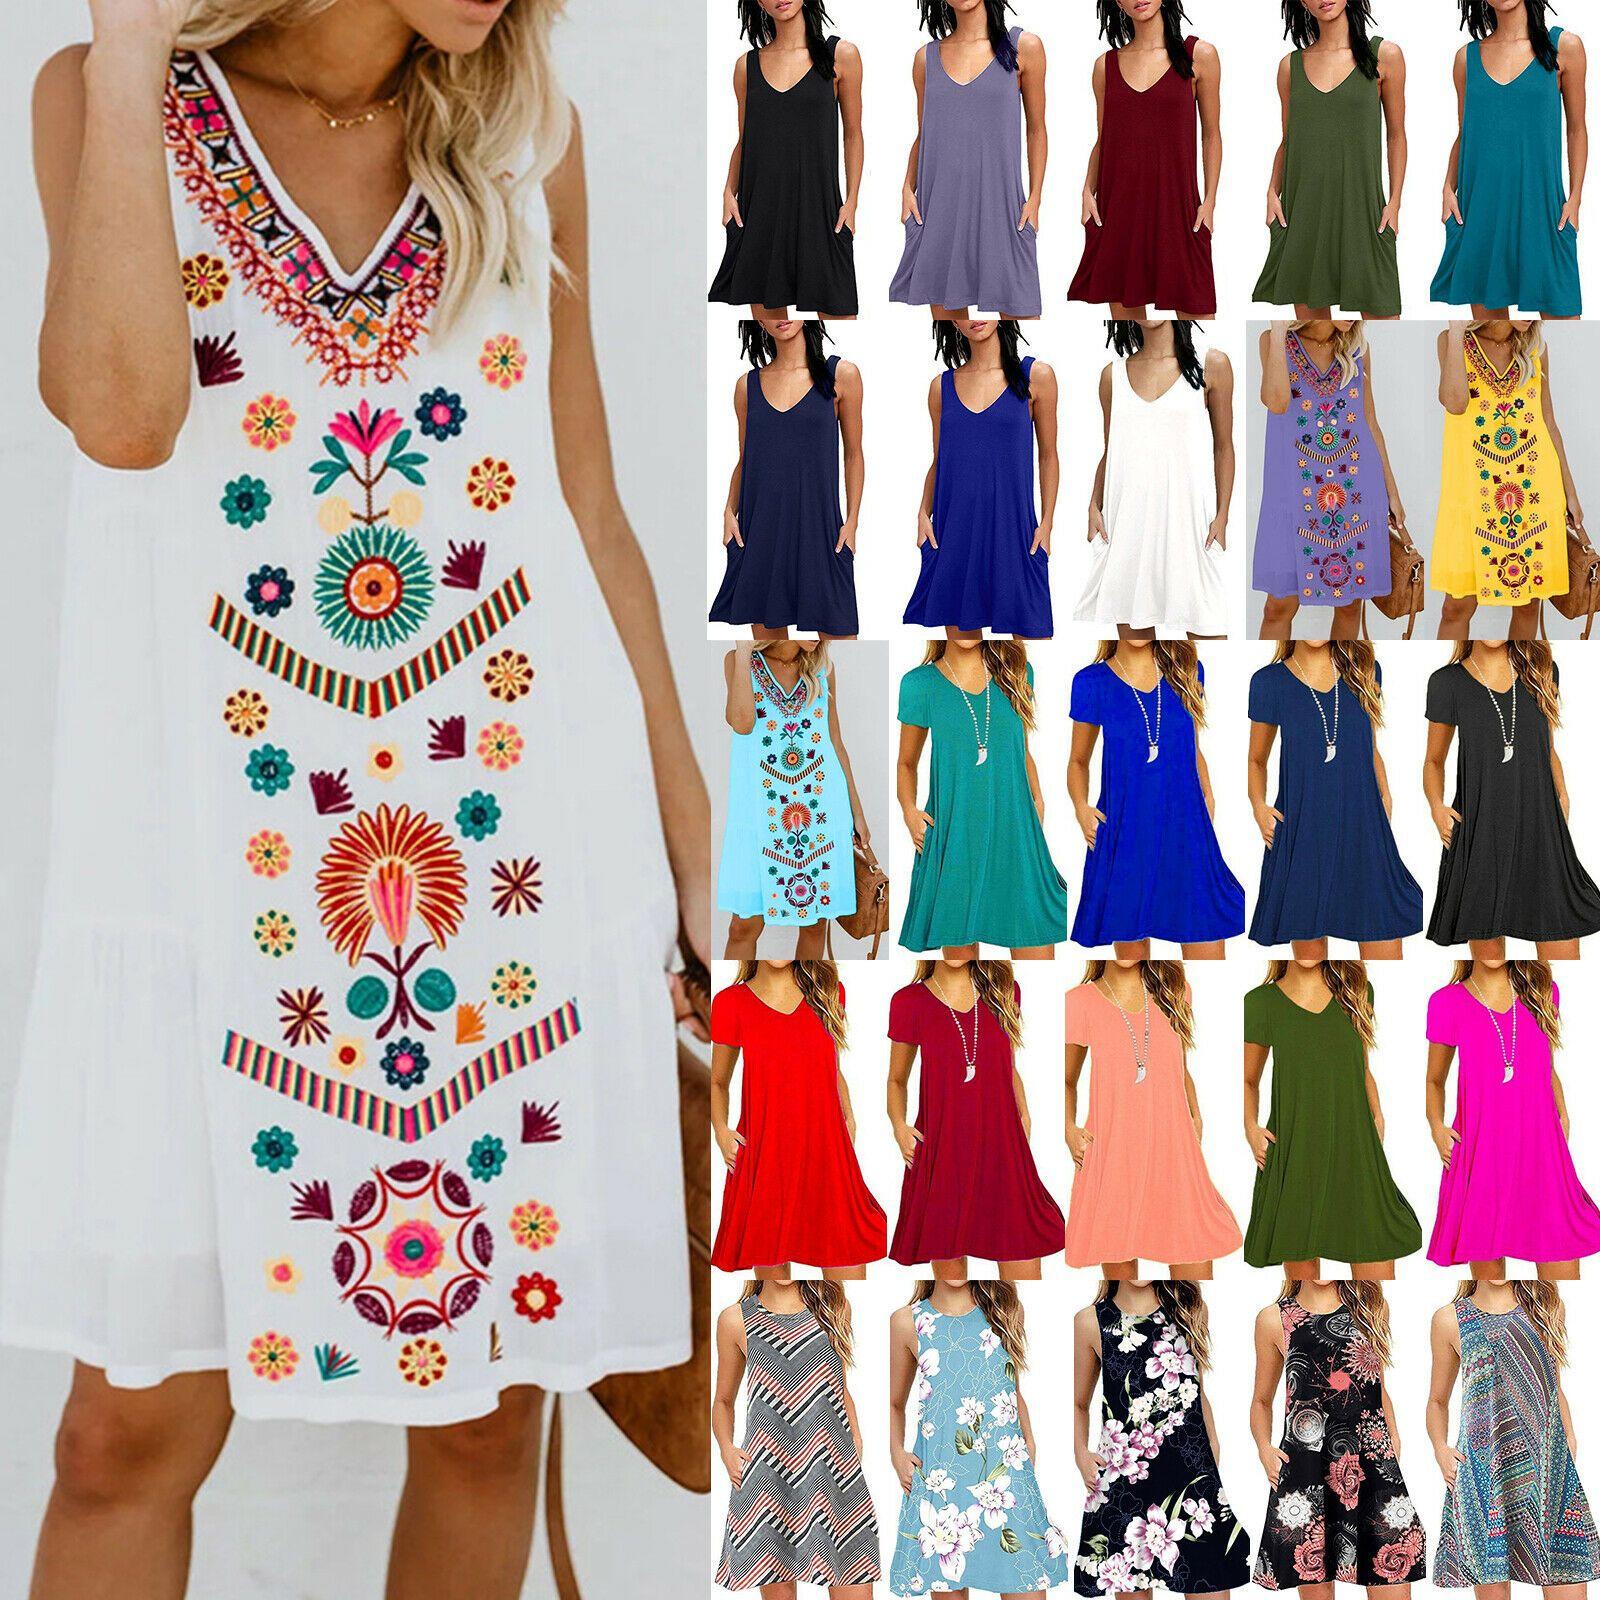 Damen Blumen Kleid Blusekleid Shirtkleid Tunikakleid Longbluse Sommerkleid 34-48